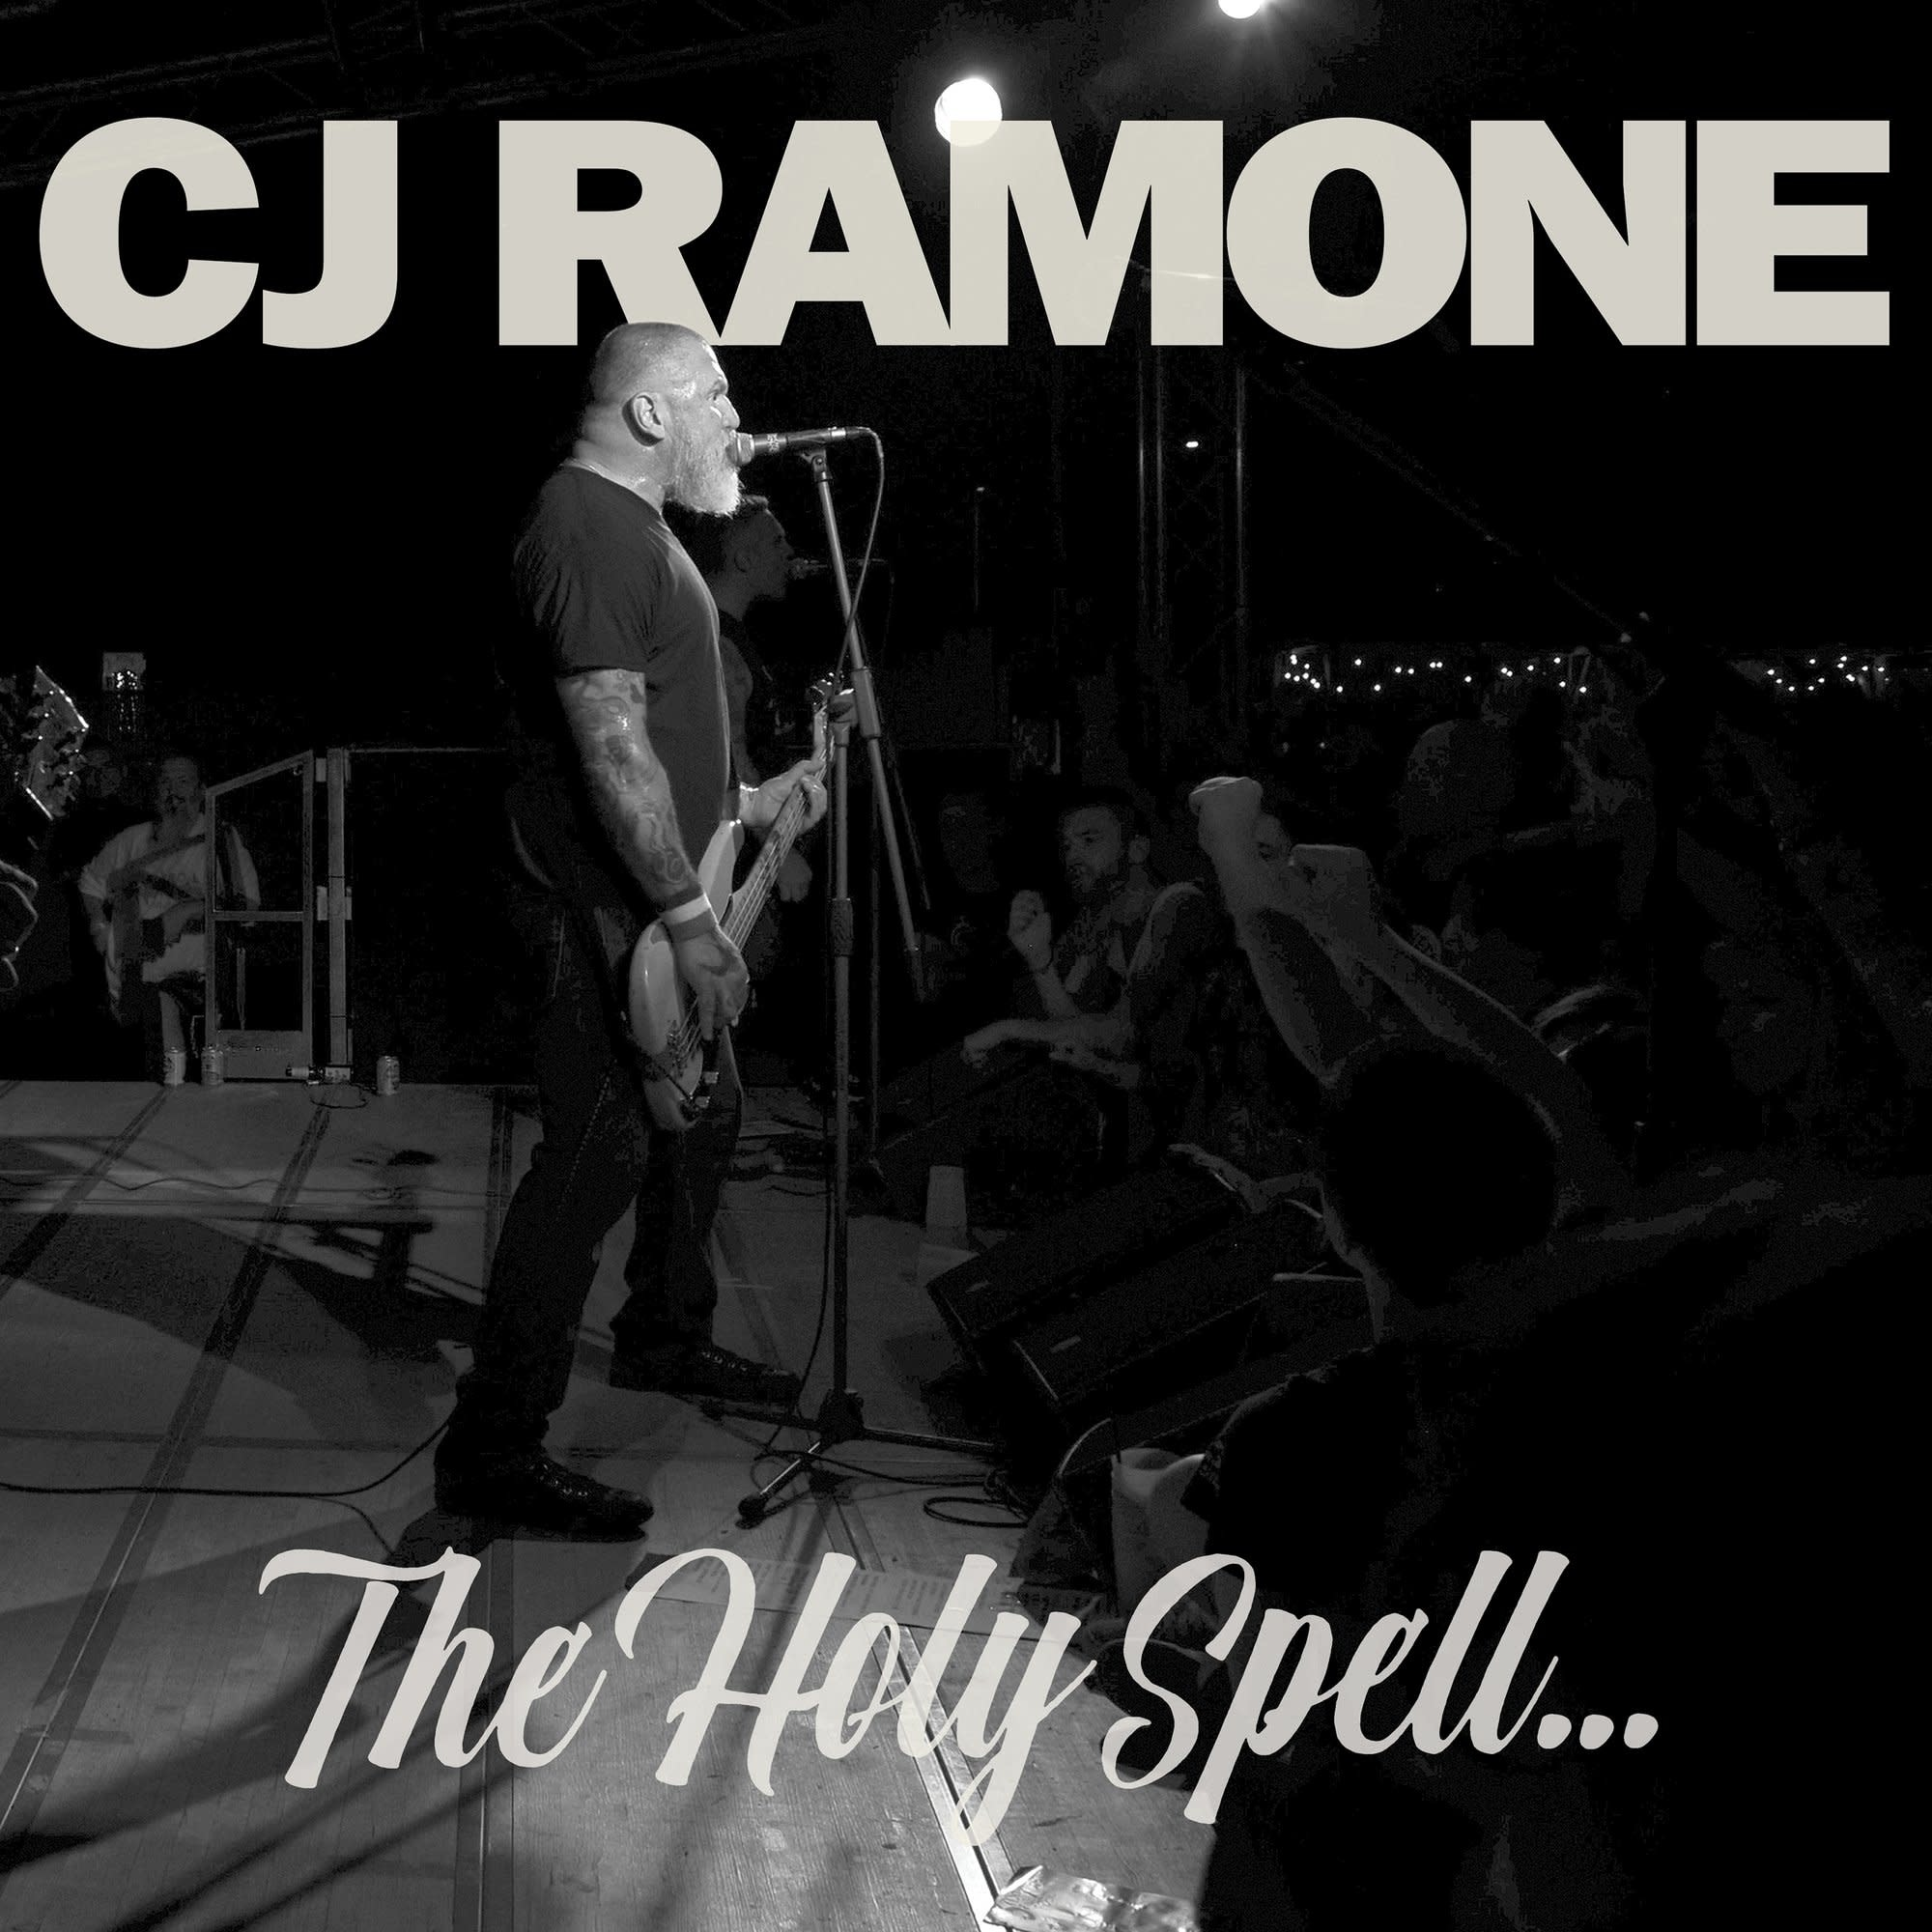 CJ Ramone - The Holy Spell...